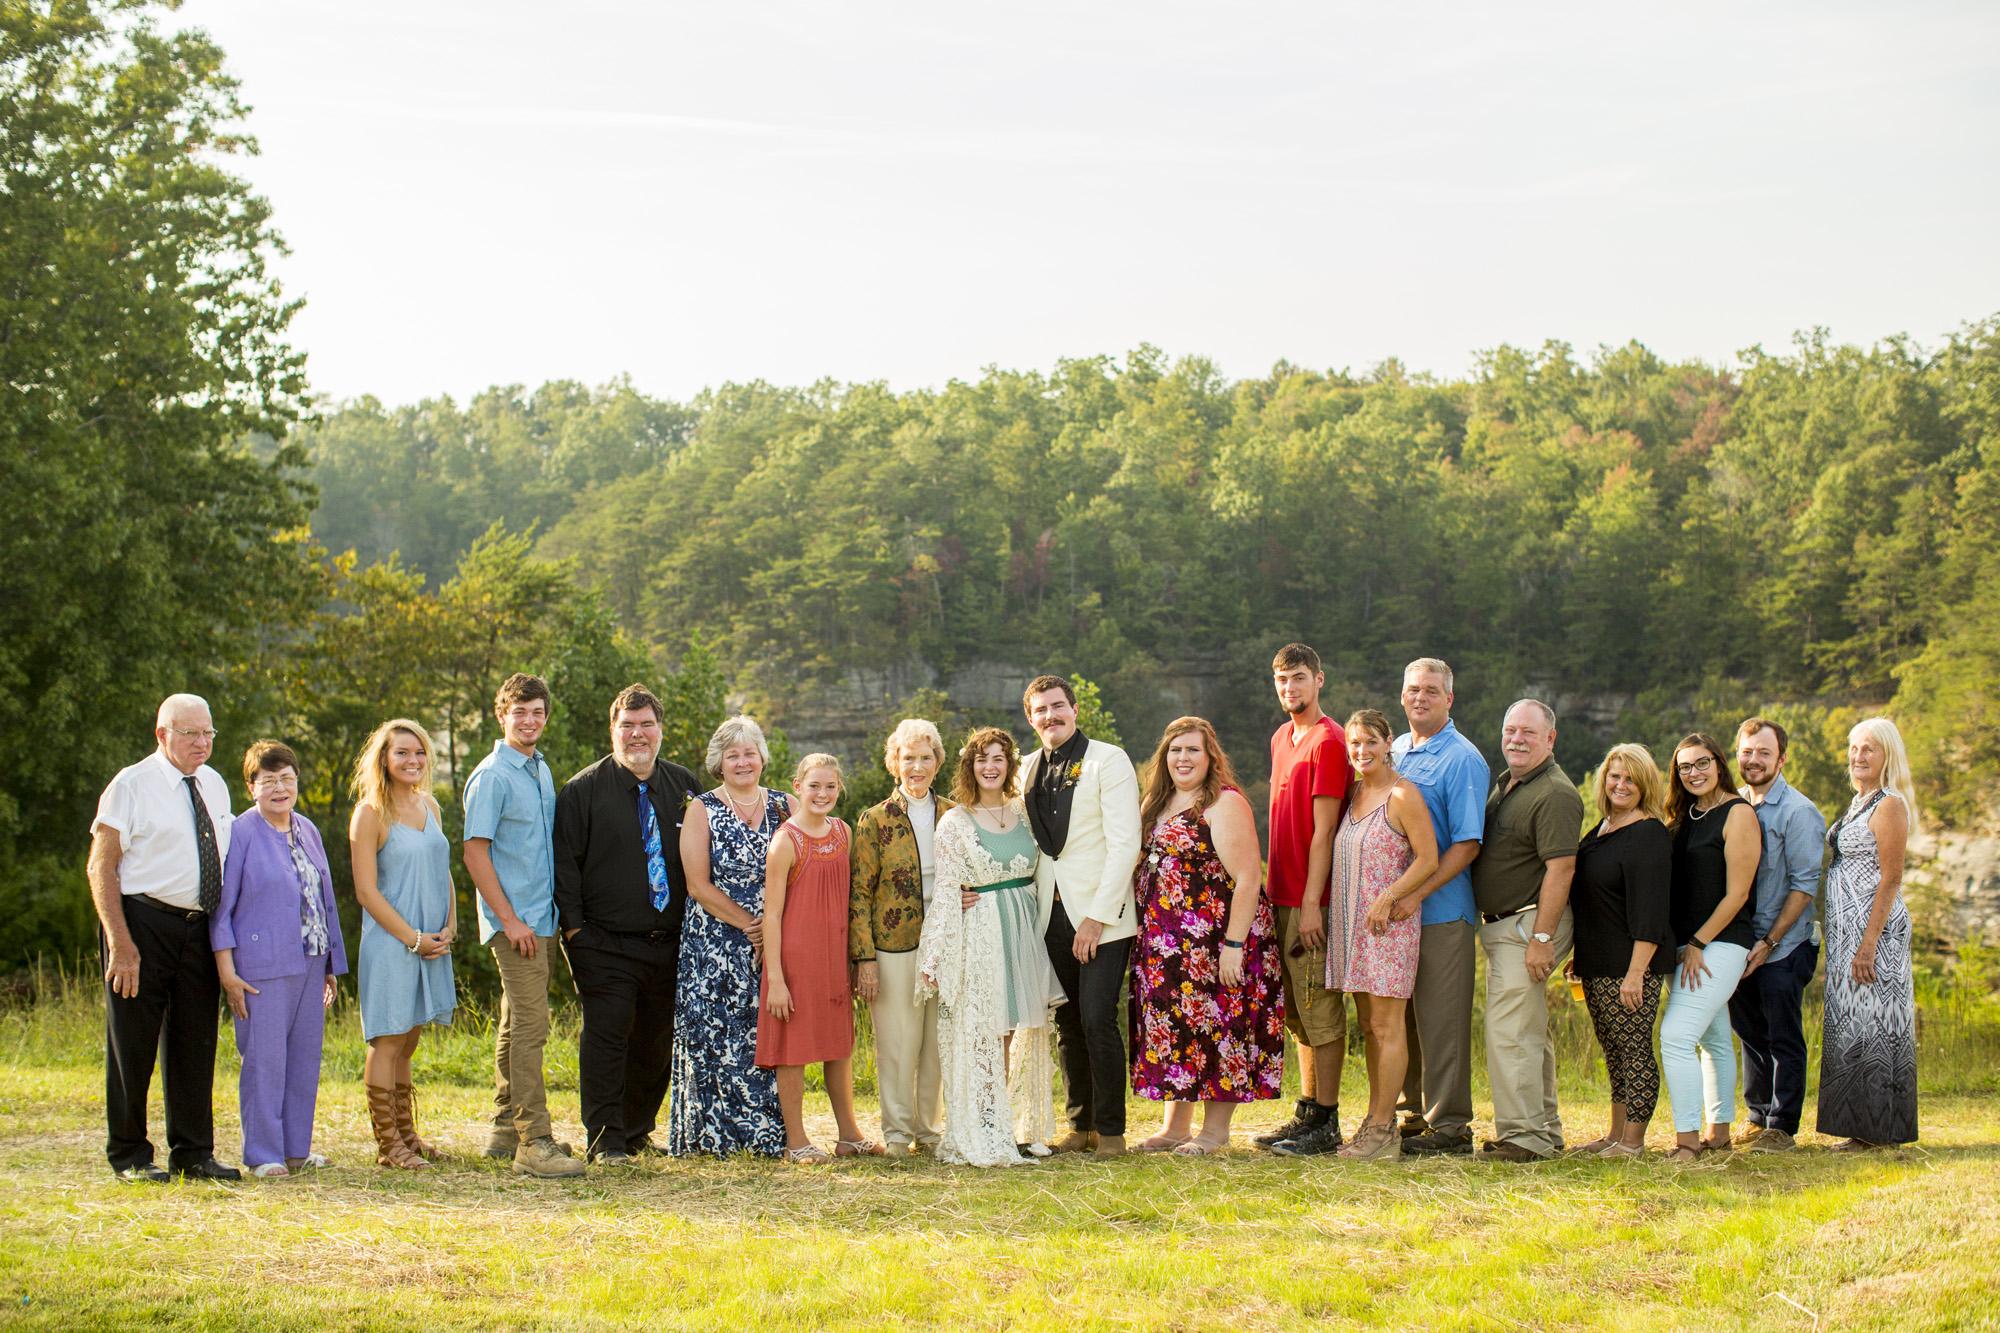 Seriously_Sabrina_Photography_Red_River_Gorge_Kentucky_Wedding_ShawnDana142.jpg